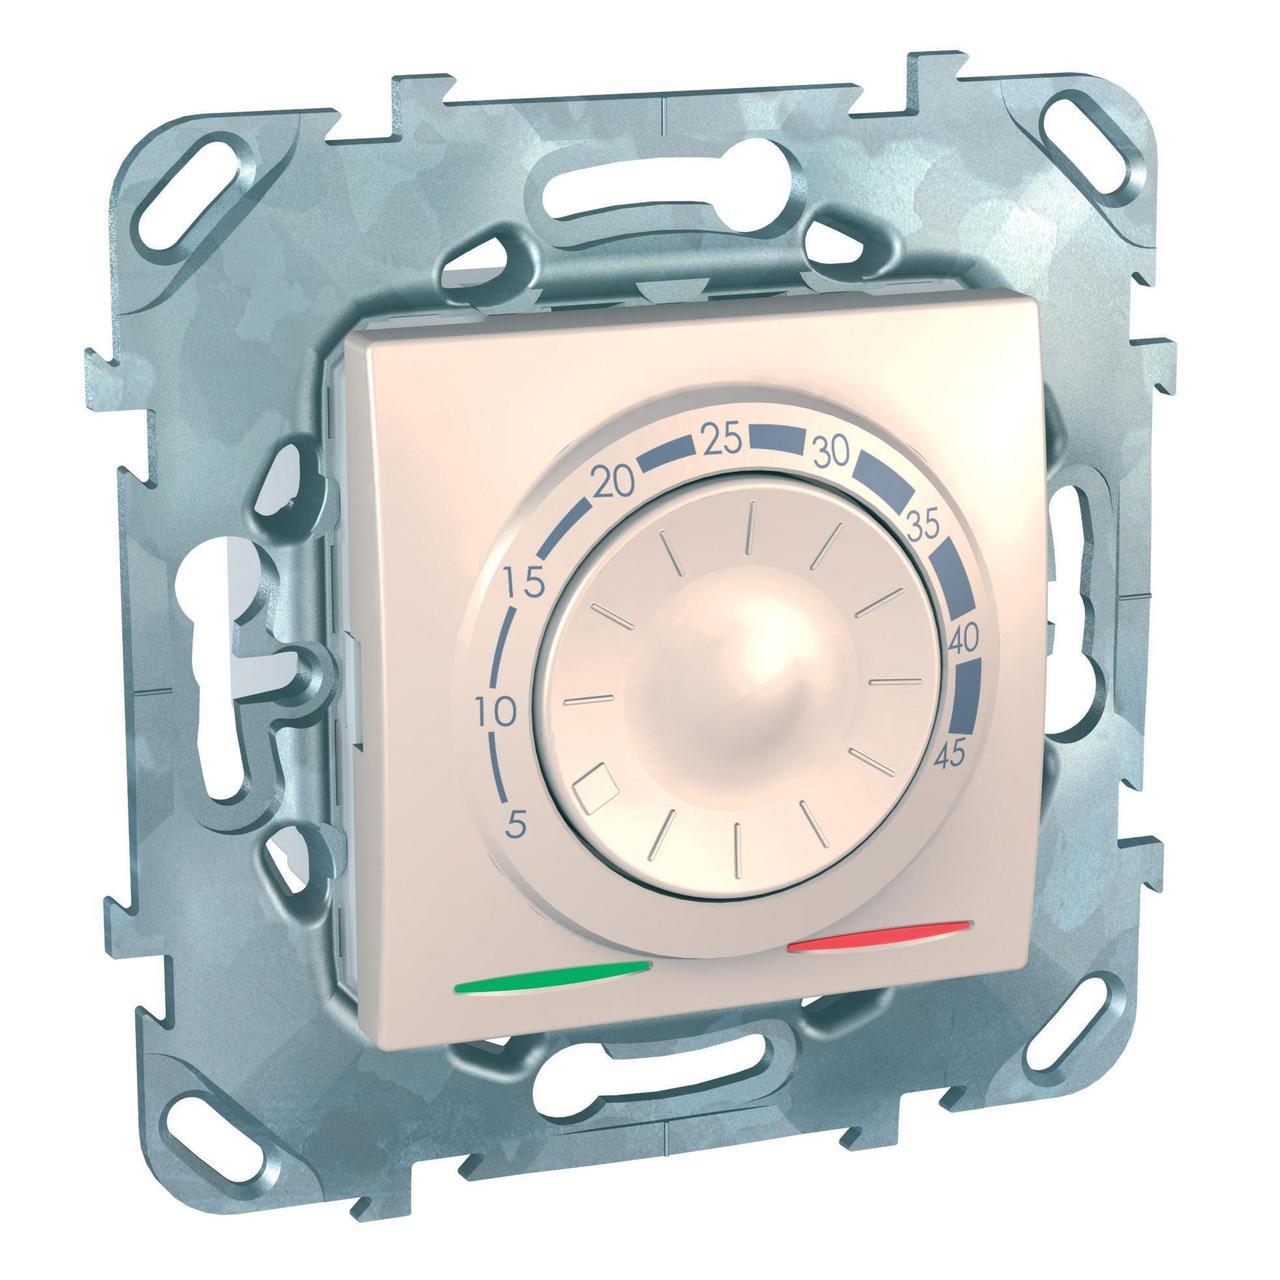 Терморегулятор для теплого пола , Бежевый, серия Unica, Schneider Electric